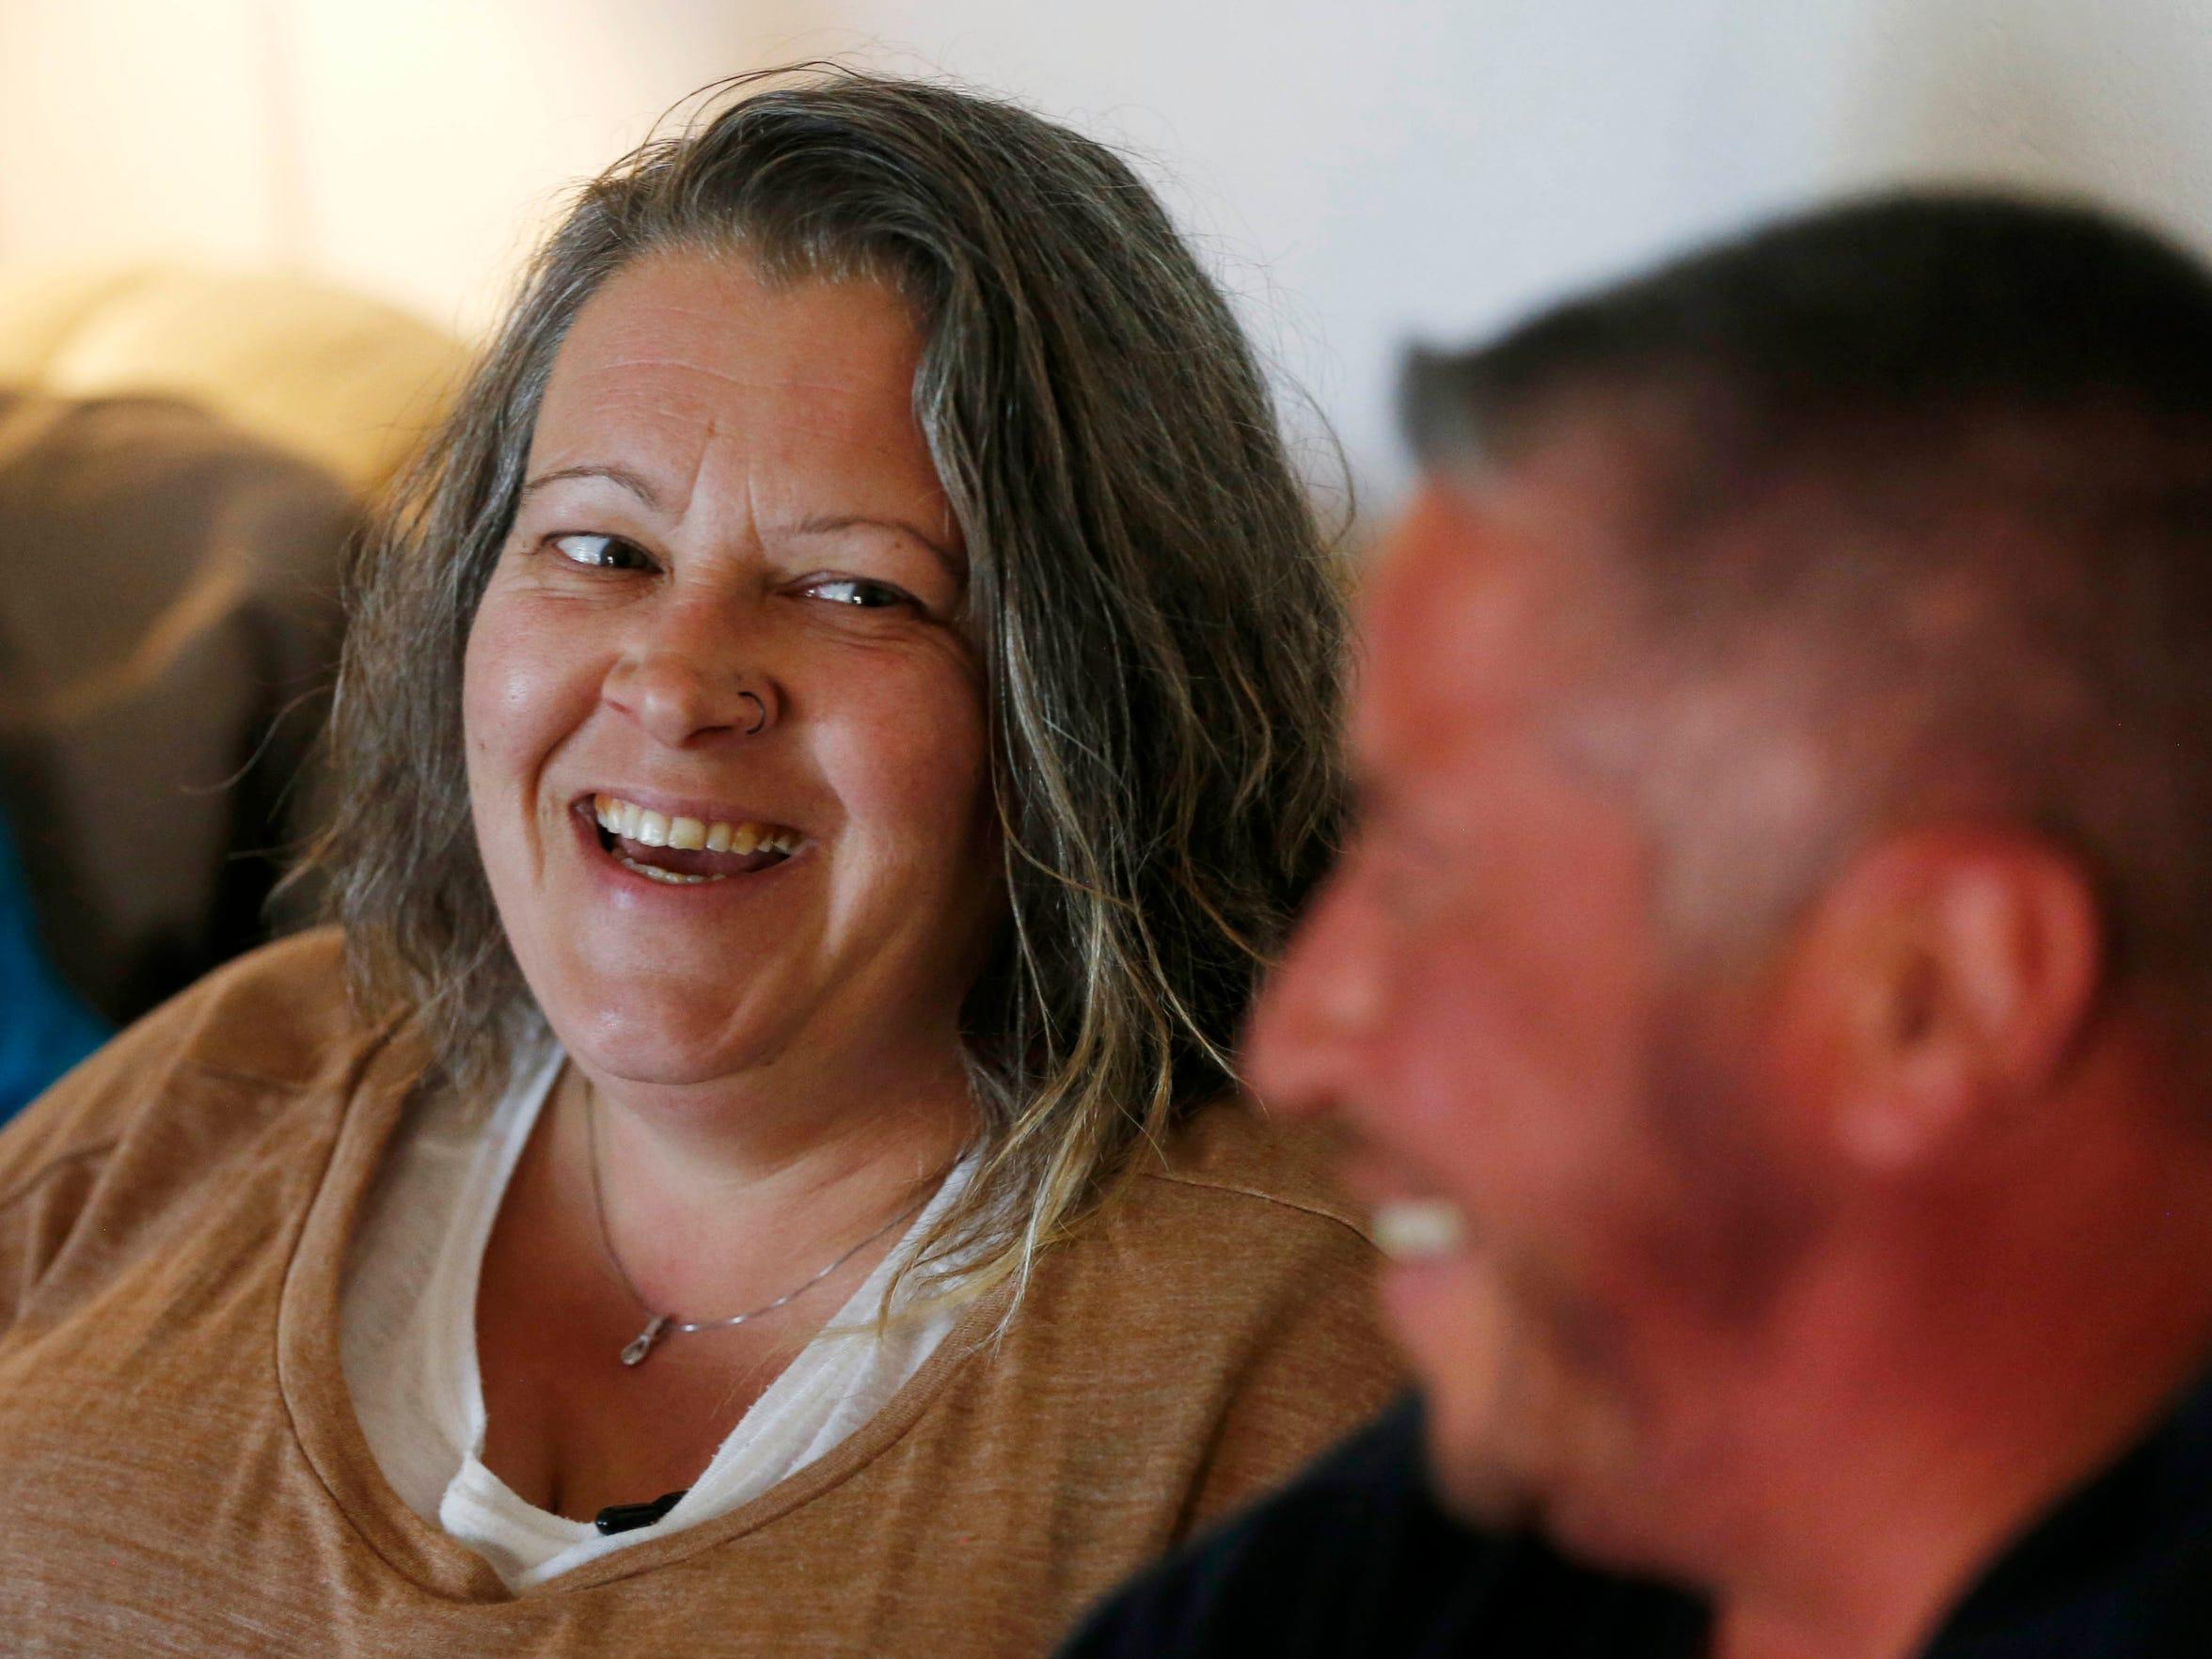 Tammi DeLathower, left, looks on and smiles as husband,